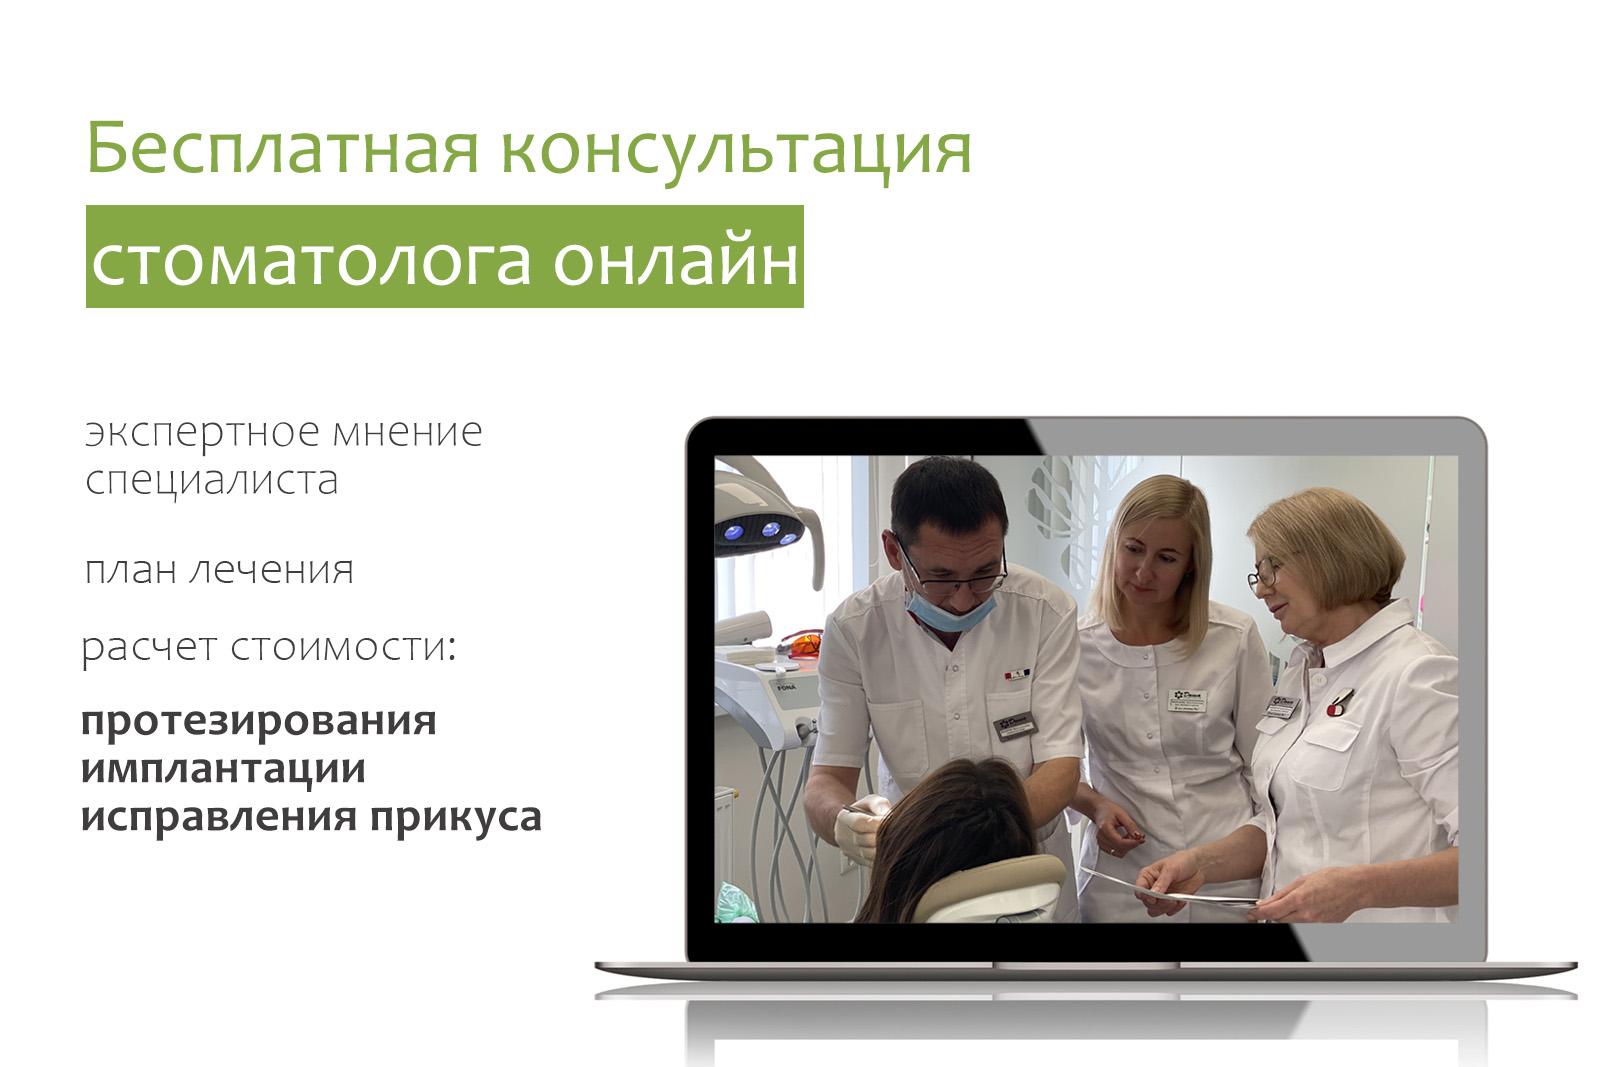 онлайн консультация стоматолога в волгограде